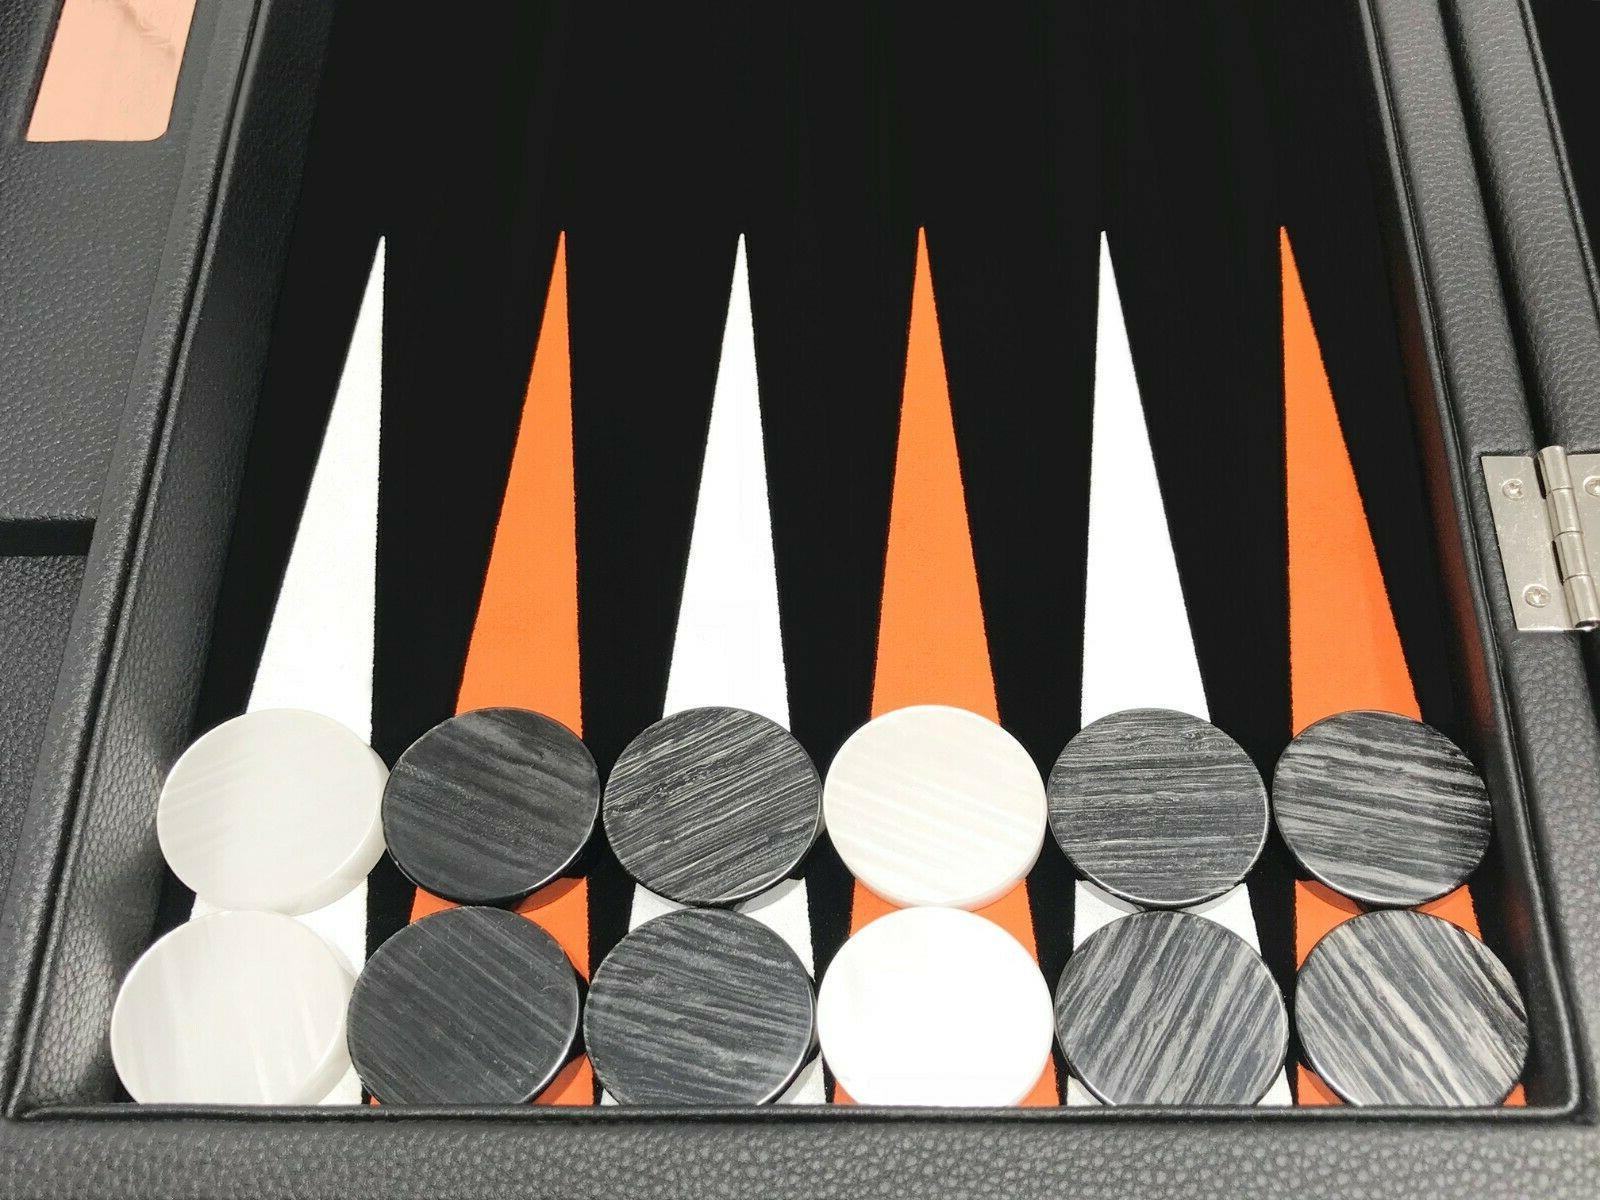 Backgammon Set-Premium Classic Game Travel